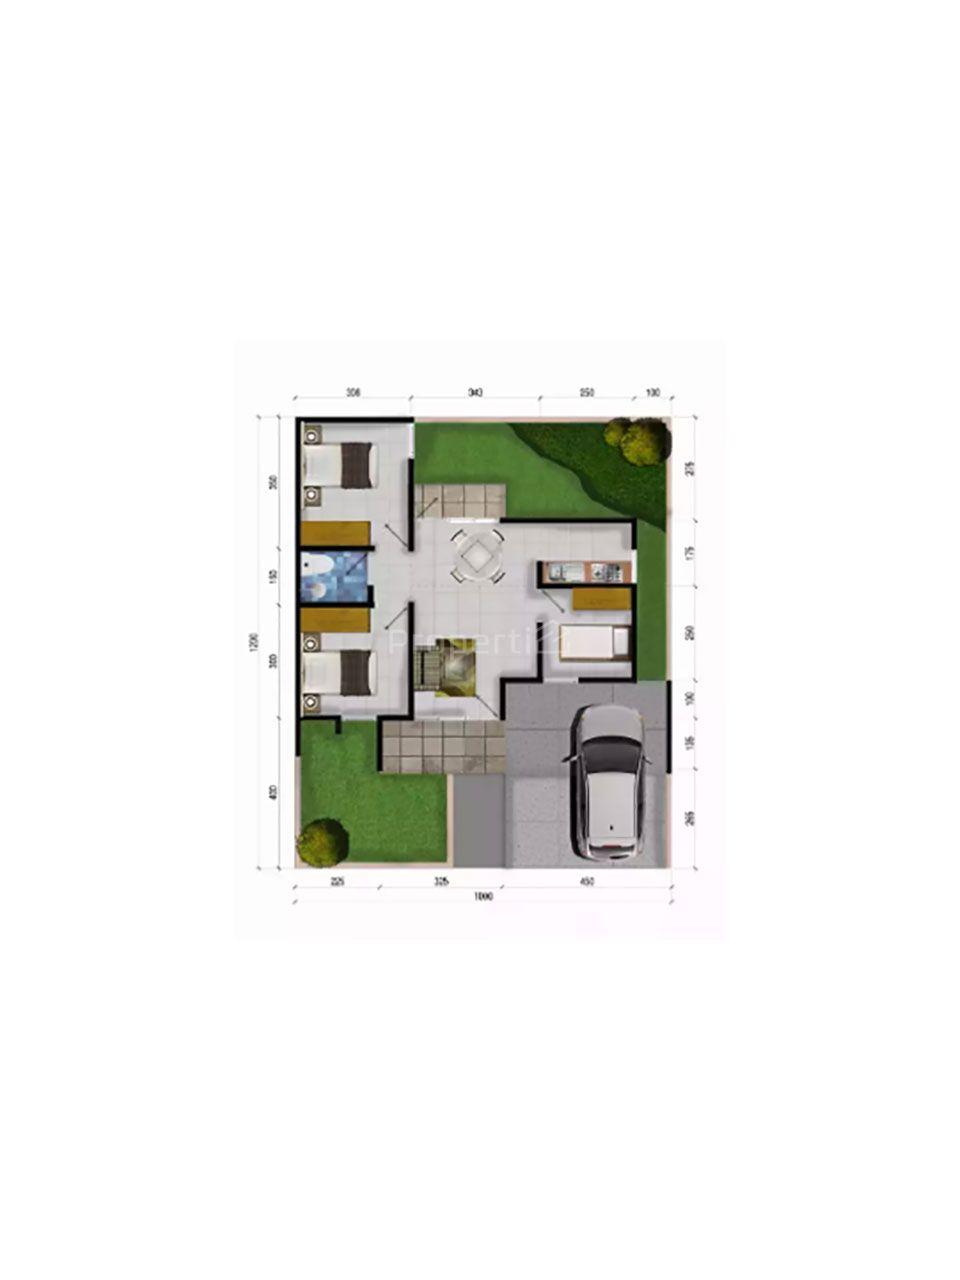 Rumah Unit Baru di Kawasan Perumahan Mewah Kota Semarang, Kota Semarang